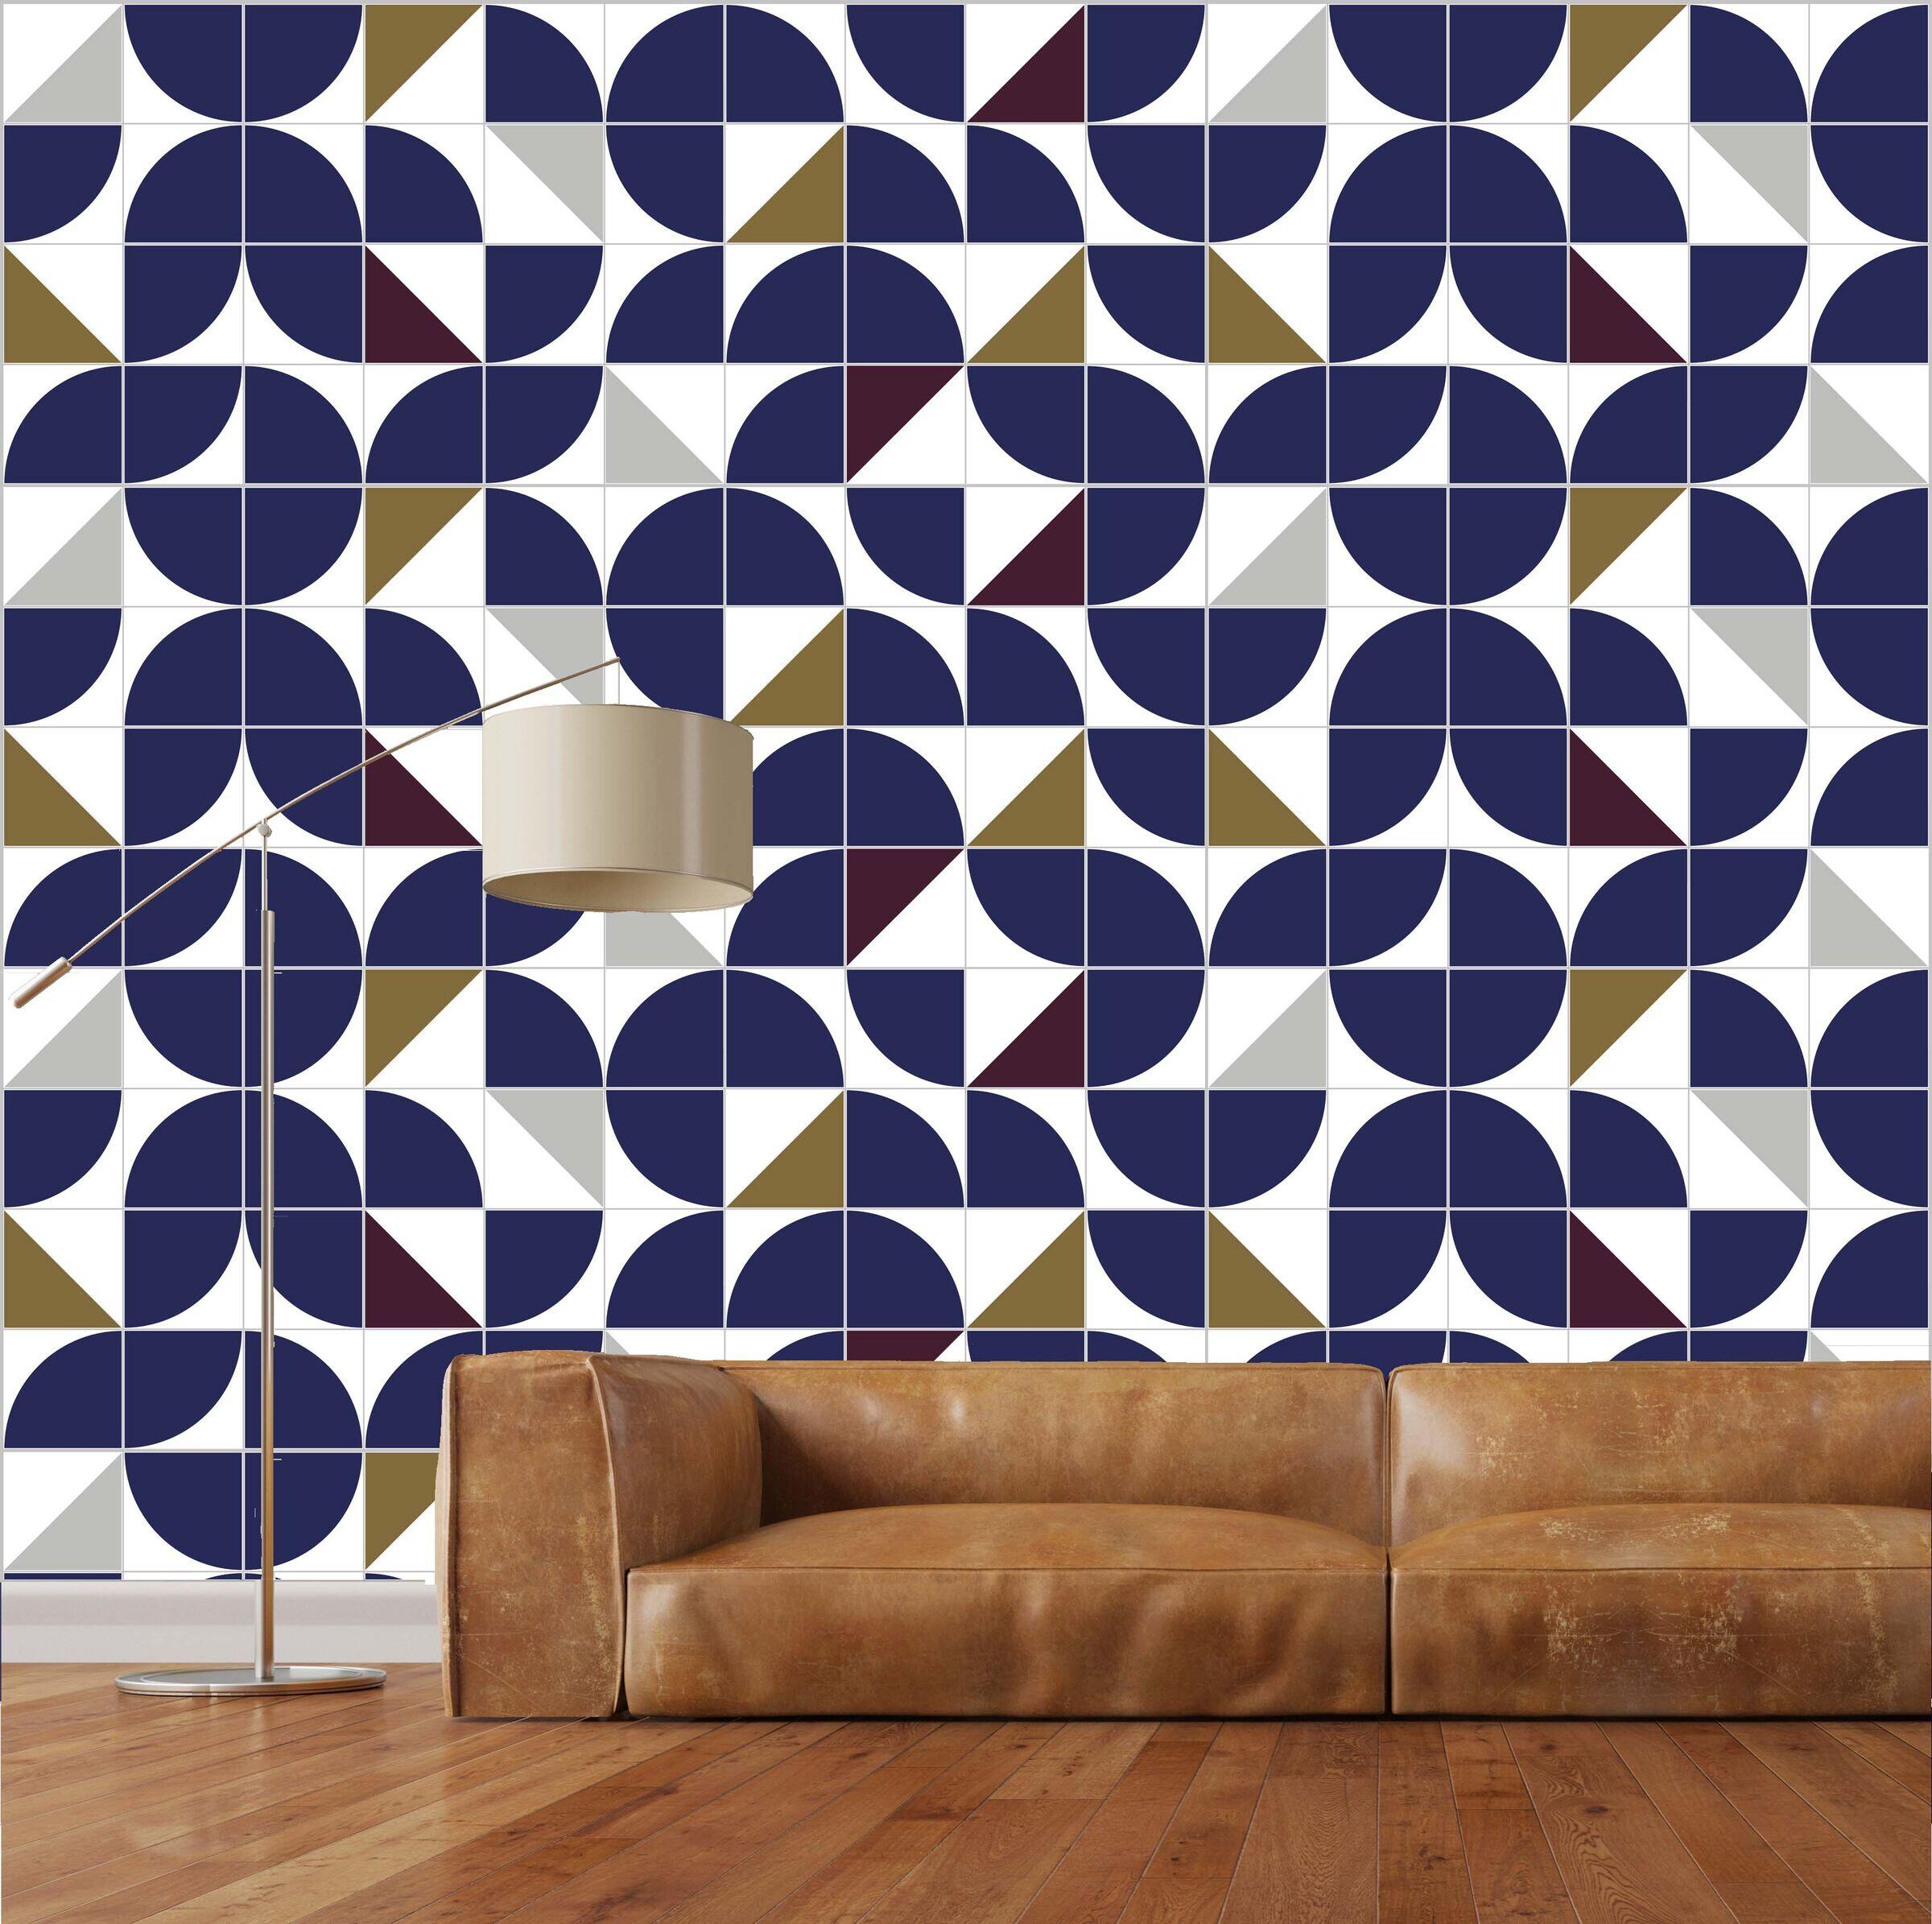 Floresta Kit Ceramic Tiles By Lurca Media Photos And Videos 1 Archello